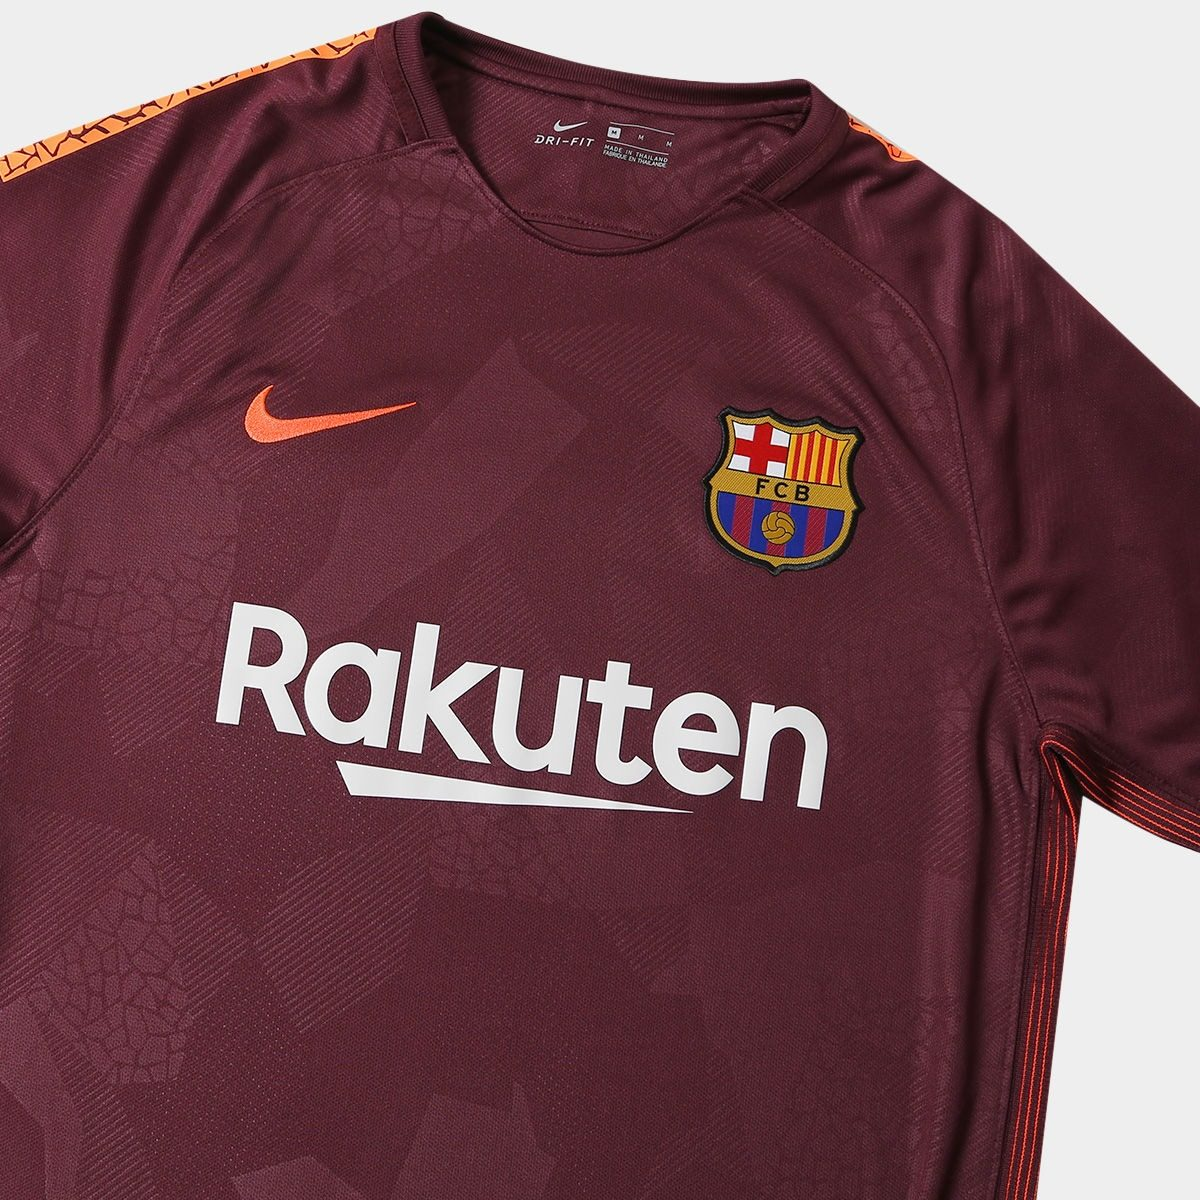 dcc53eba24e84 camisa barcelona third 17 18 s n° - torcedor nike masculina. Carregando  zoom.